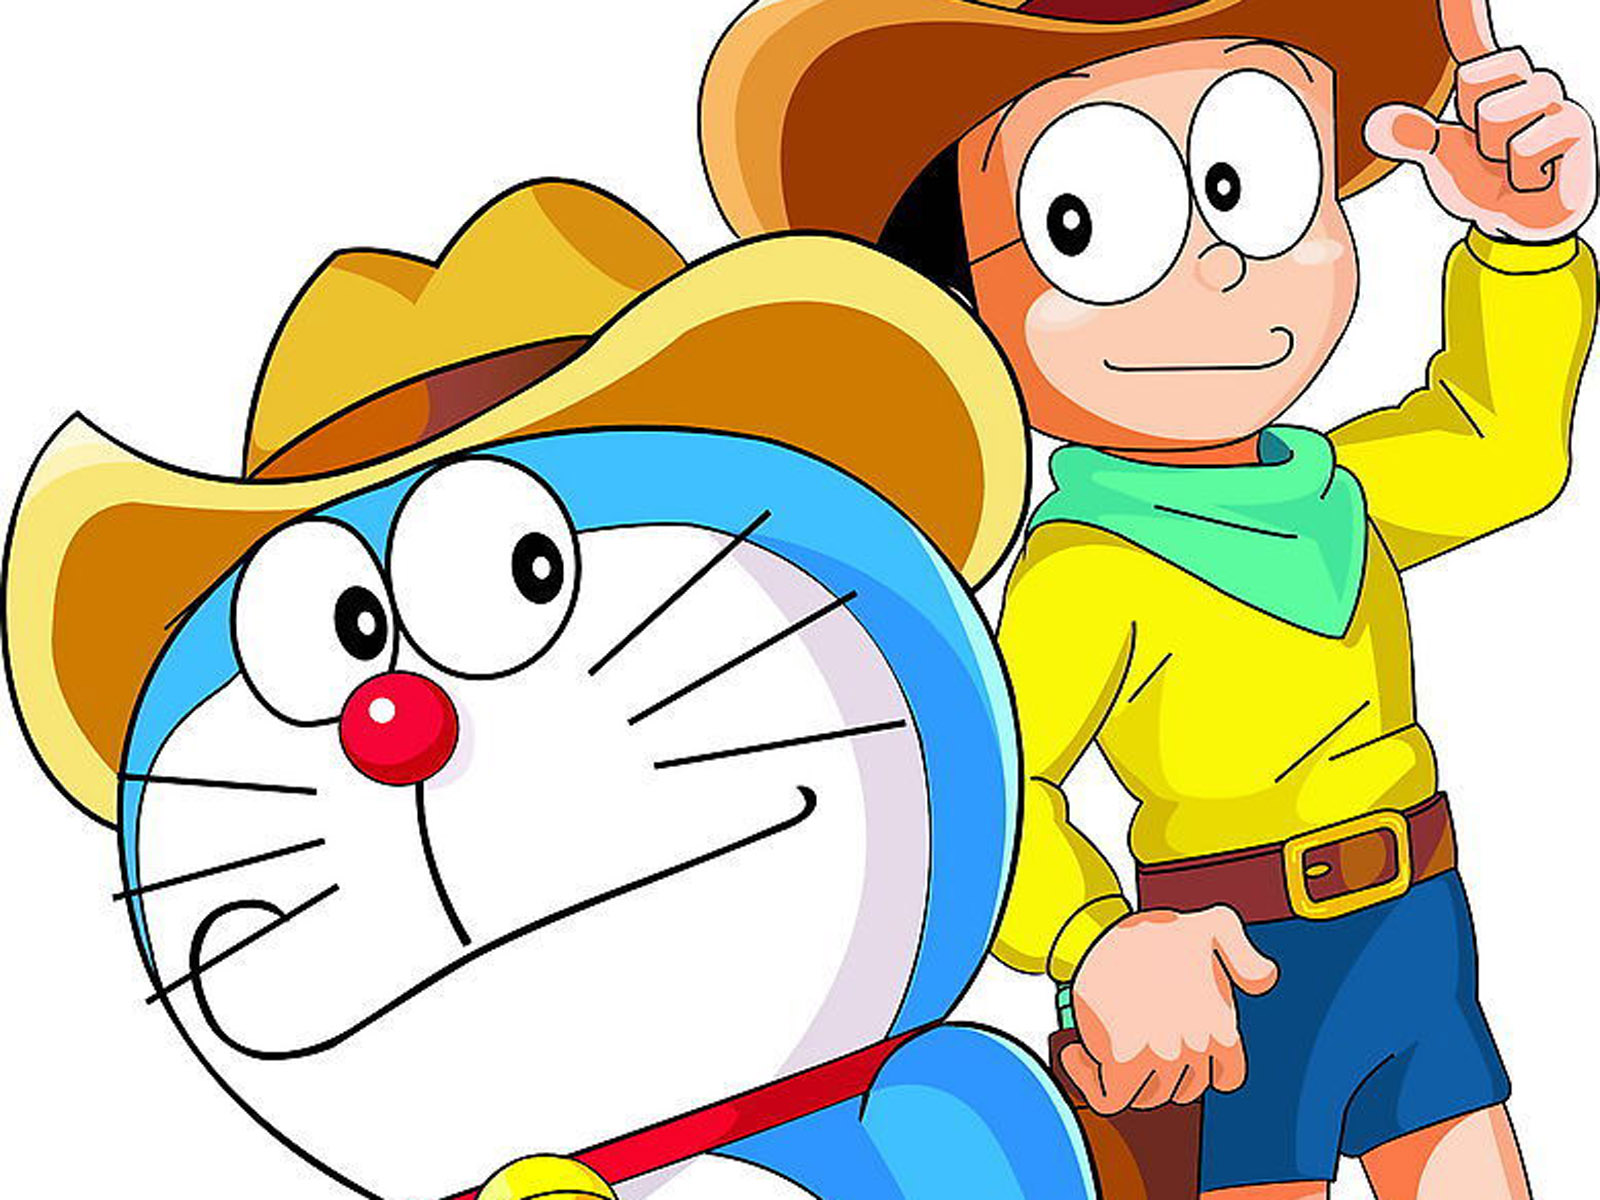 Shin Chan And Doraemon Welcome to the doraemon